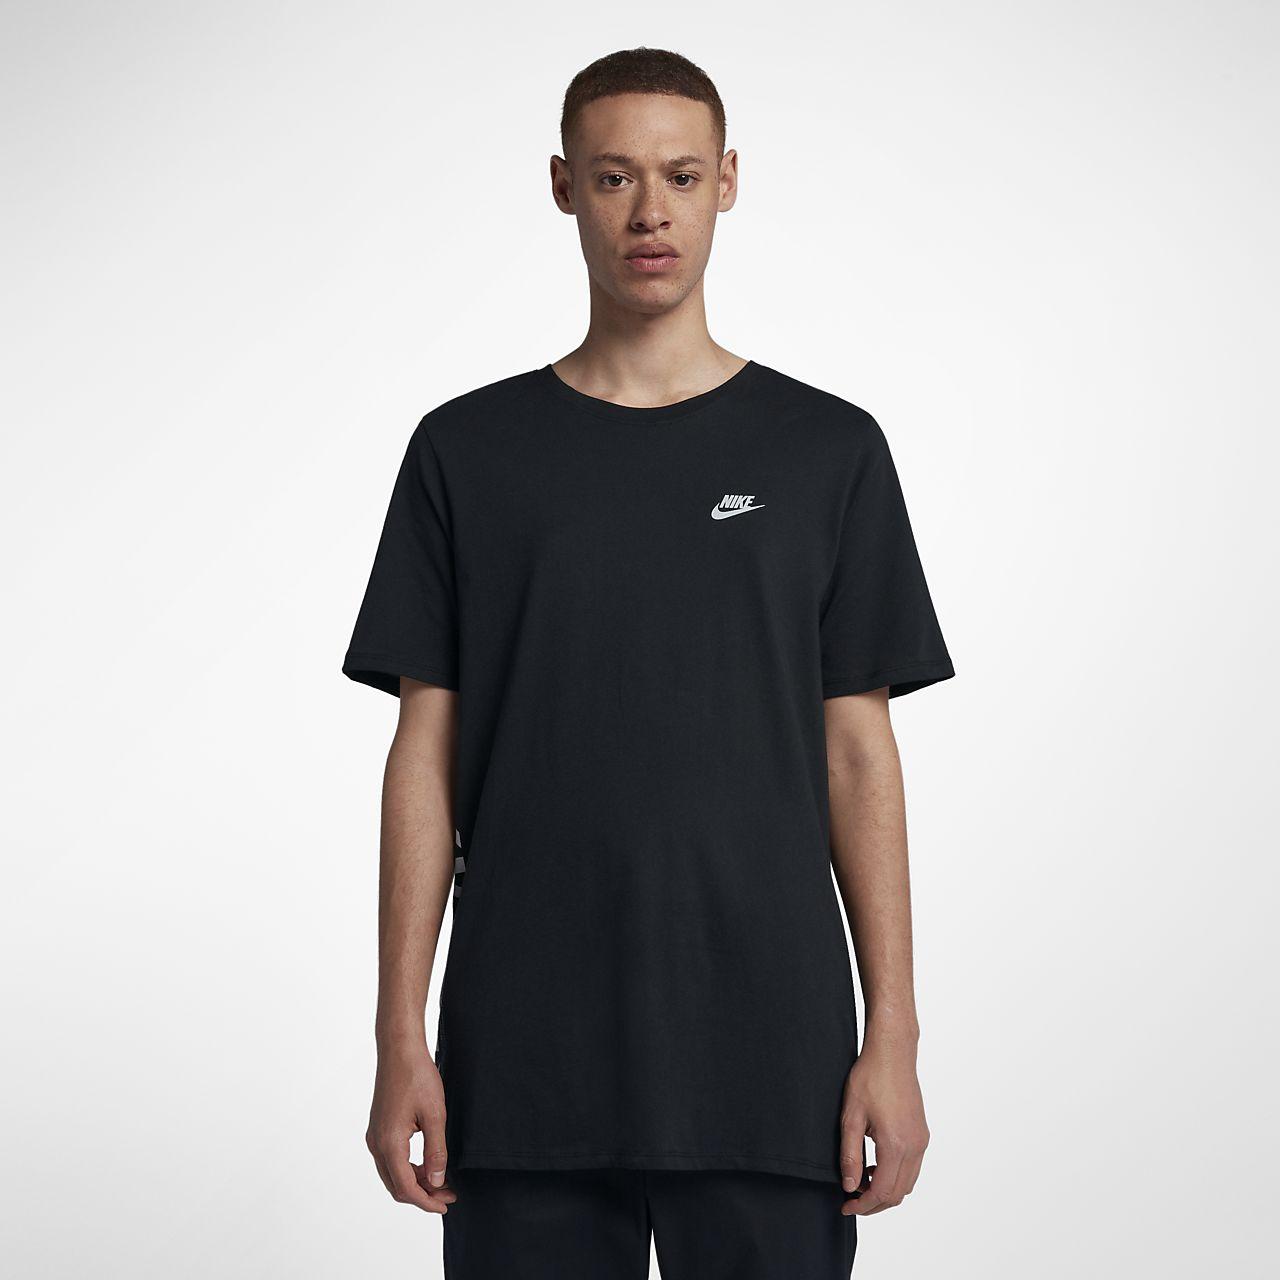 Pánské tričko Nike Sportswear Air Max. Nike.com CZ 31f4a8acaee